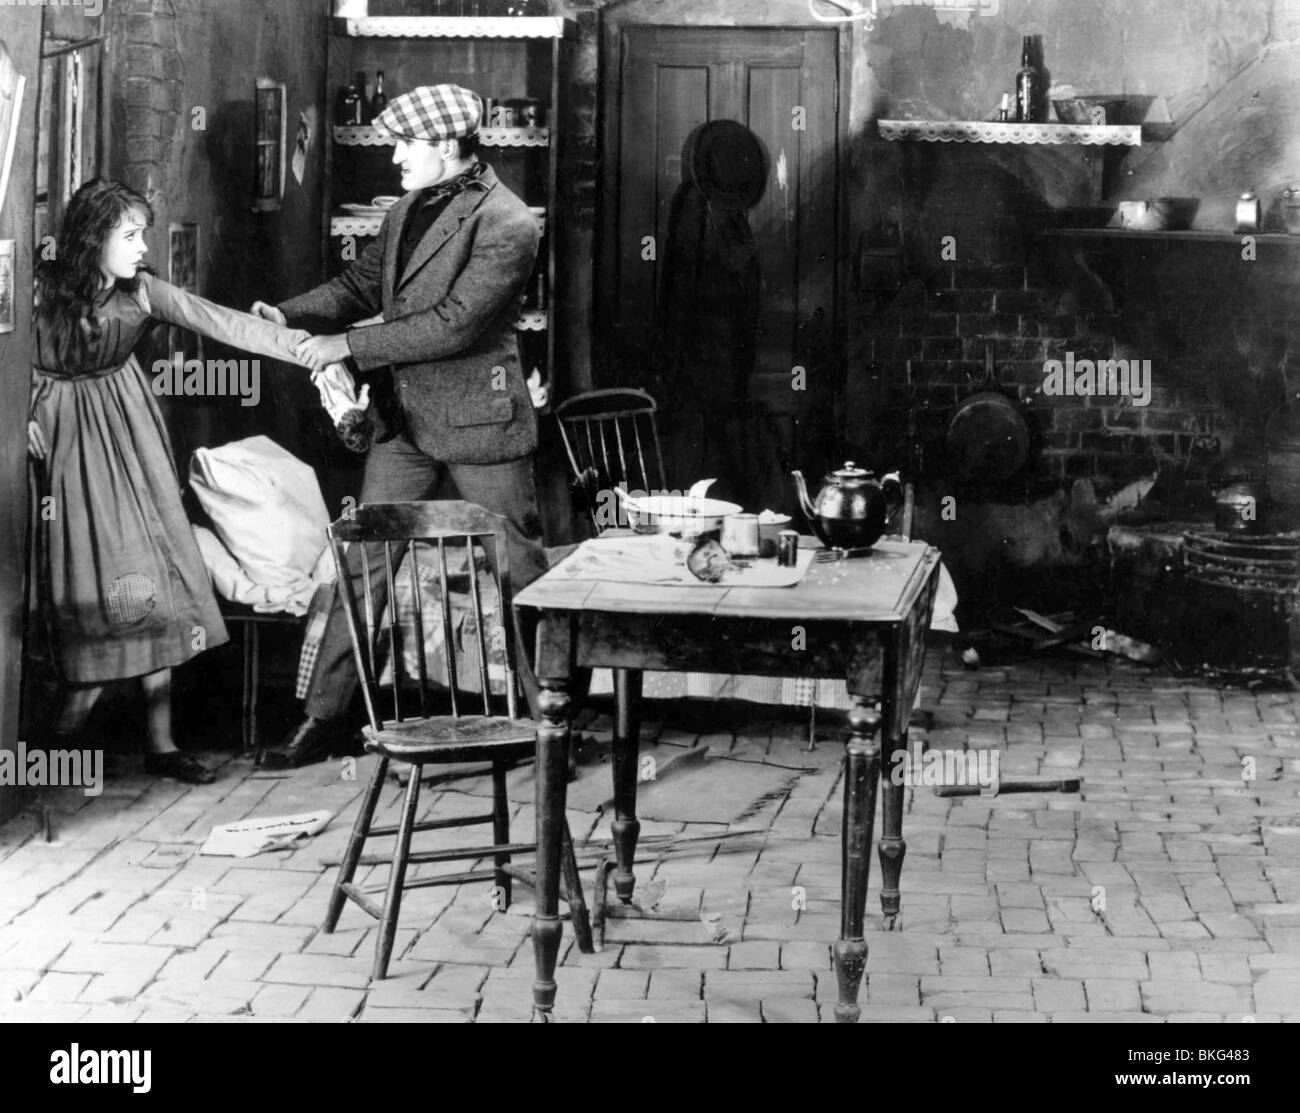 BROKEN BLOSSOMS (1919) LILLIAN GISH, DONALD CRISP, D.W. GRIFFITH (DIR) BKBL 002 P - Stock Image